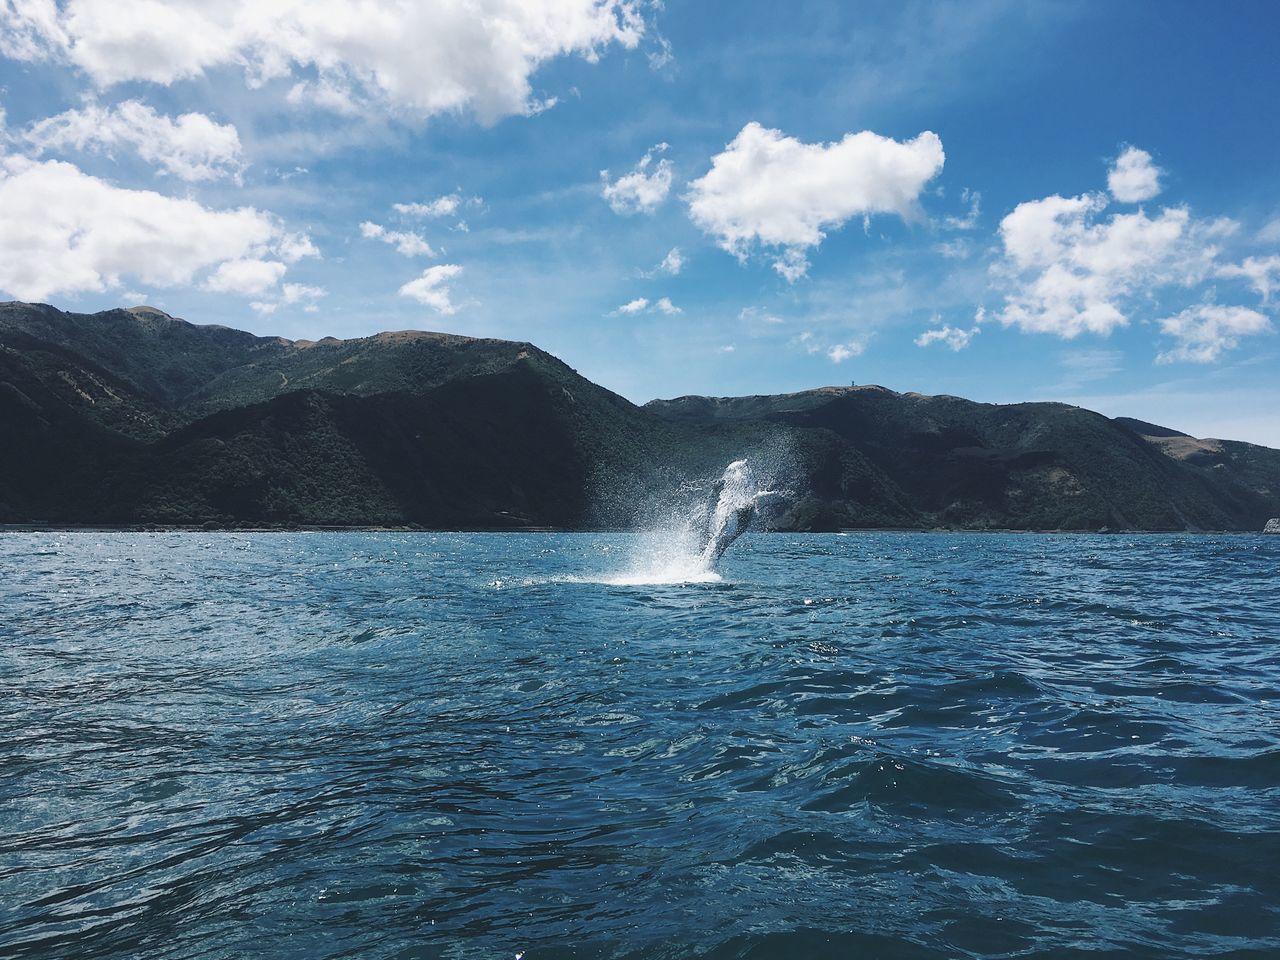 Whale Splash Beauty In Nature Sea One Animal Swimming Aquatic Mammal Day Outdoors Kaikoura New Zealand